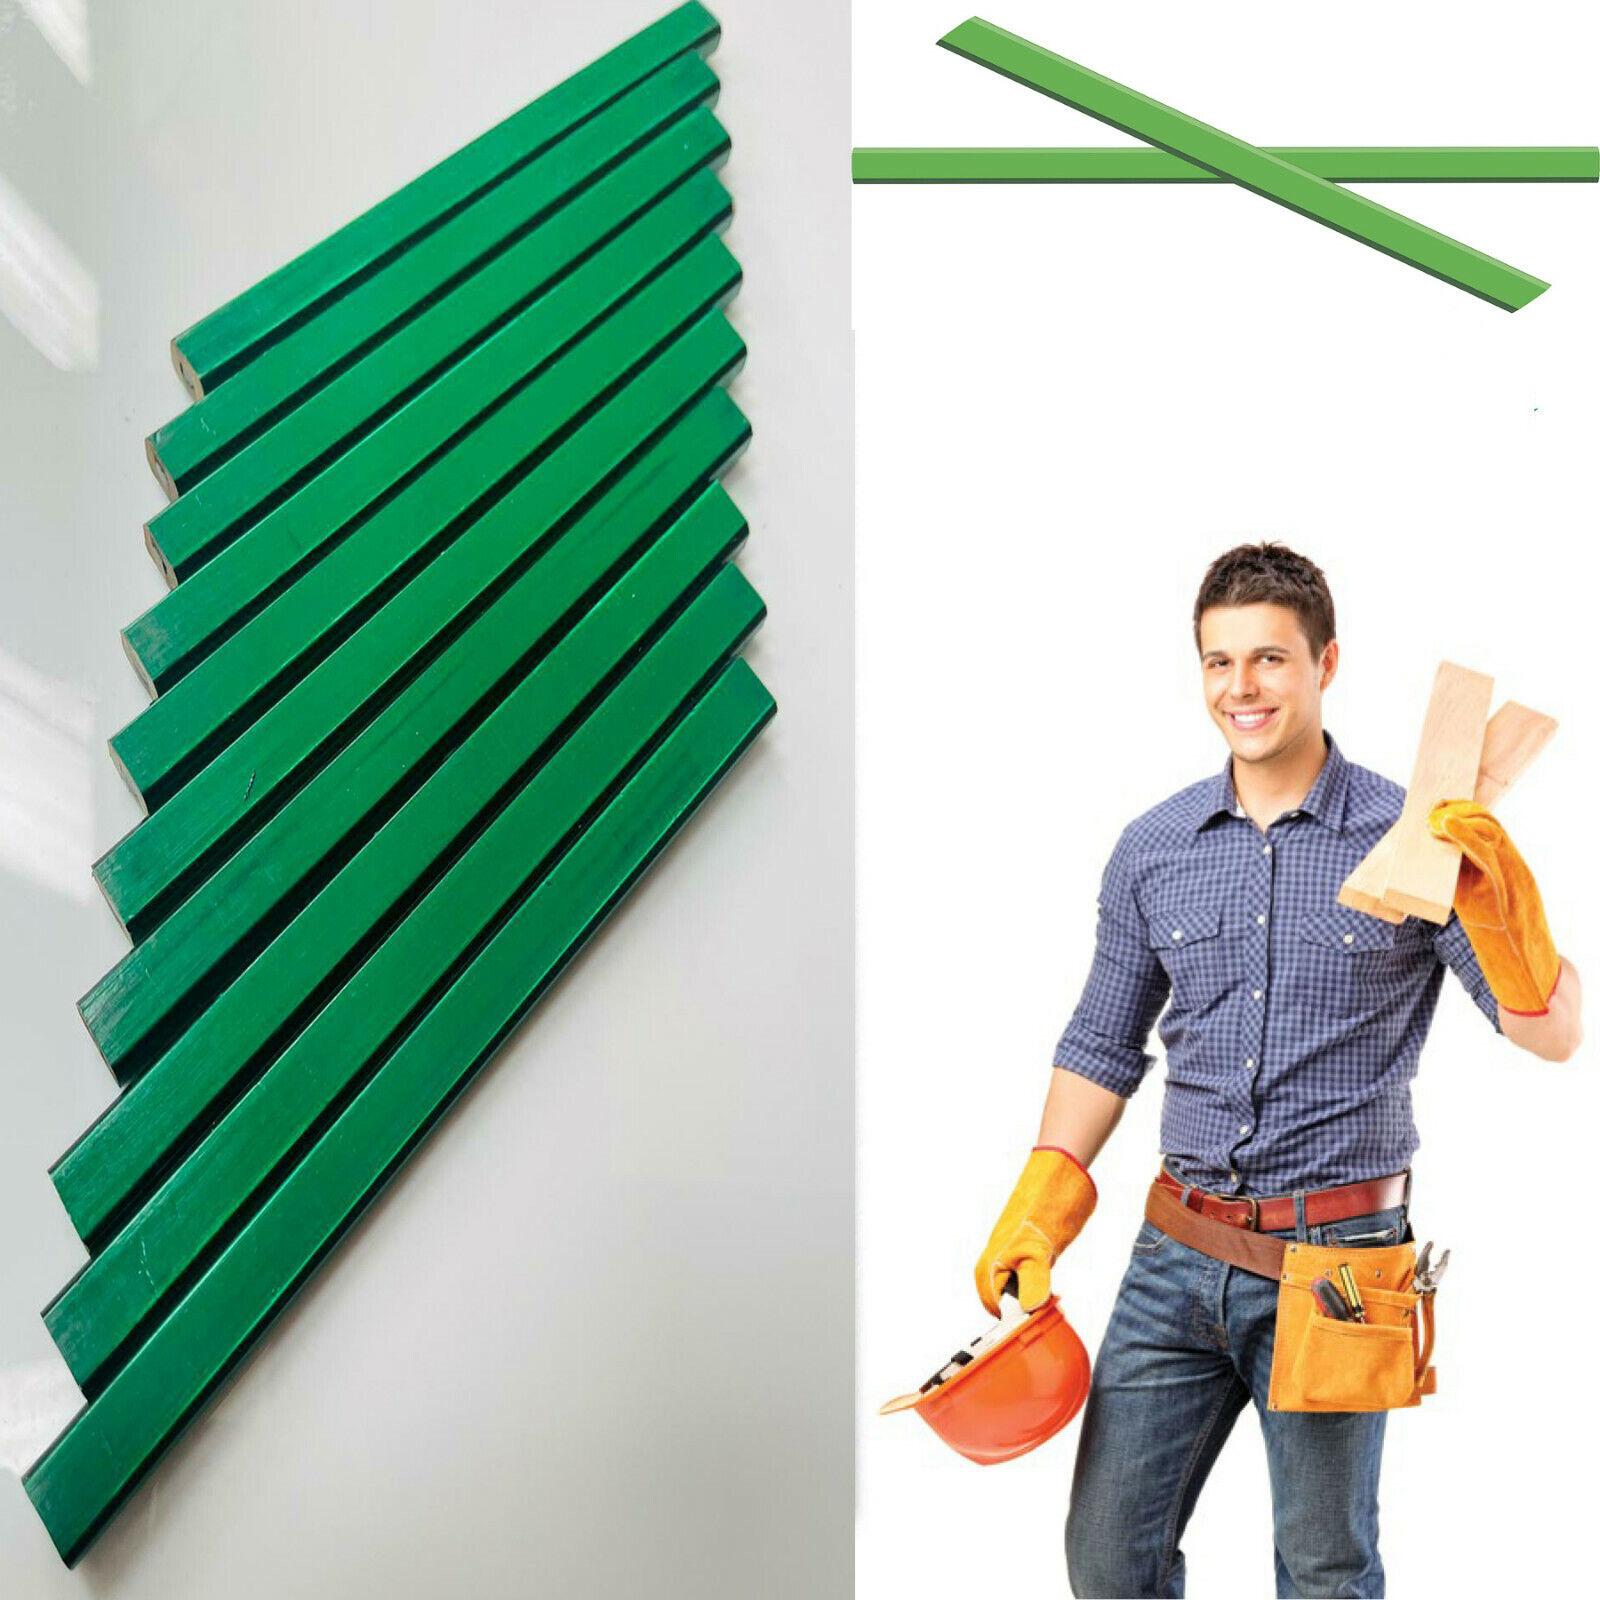 10X CARPENTERS PENCILS BLACKEDGE REXEL H HARD GREEN wood brick plaster